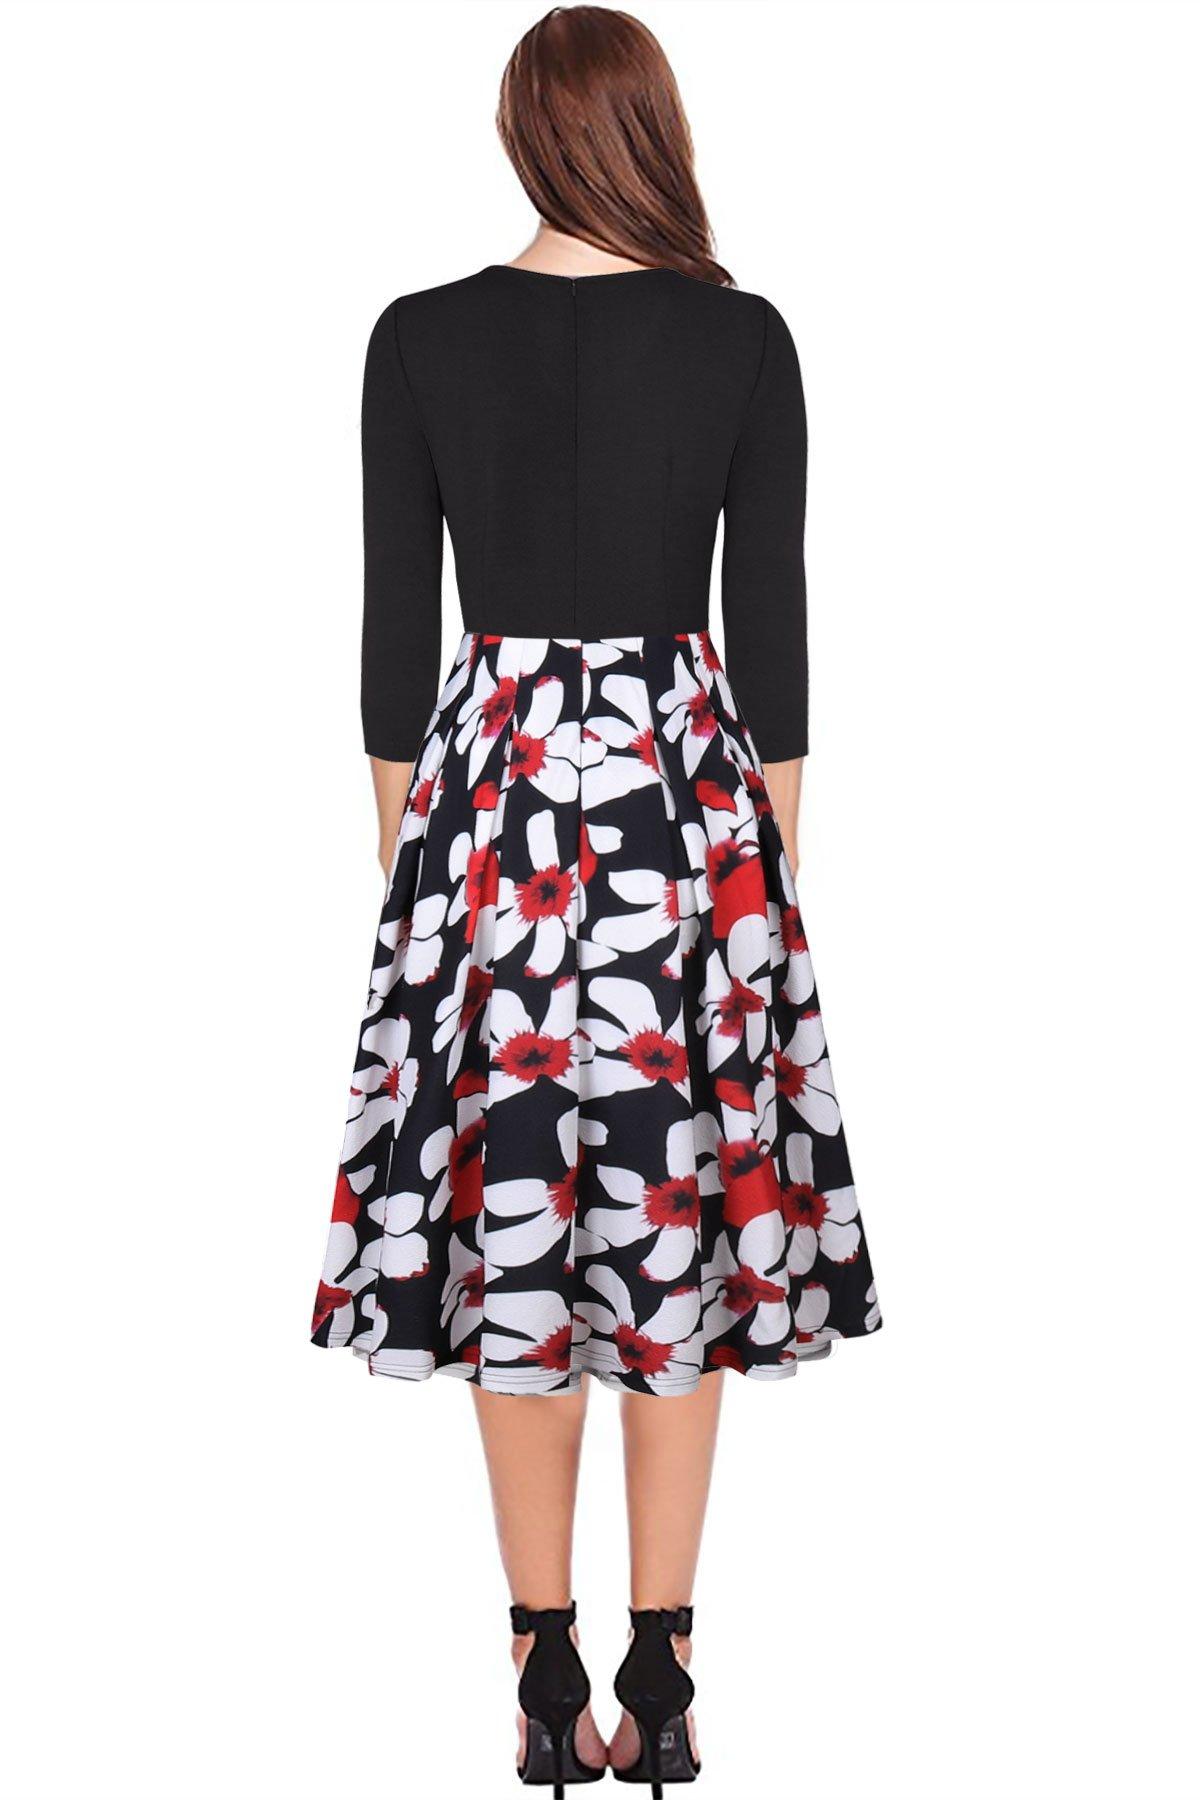 Black Church Dresses for Women Midi Pocket 3/4 Sleeve Fit and Flare Winter  Dress Plus Size XXL